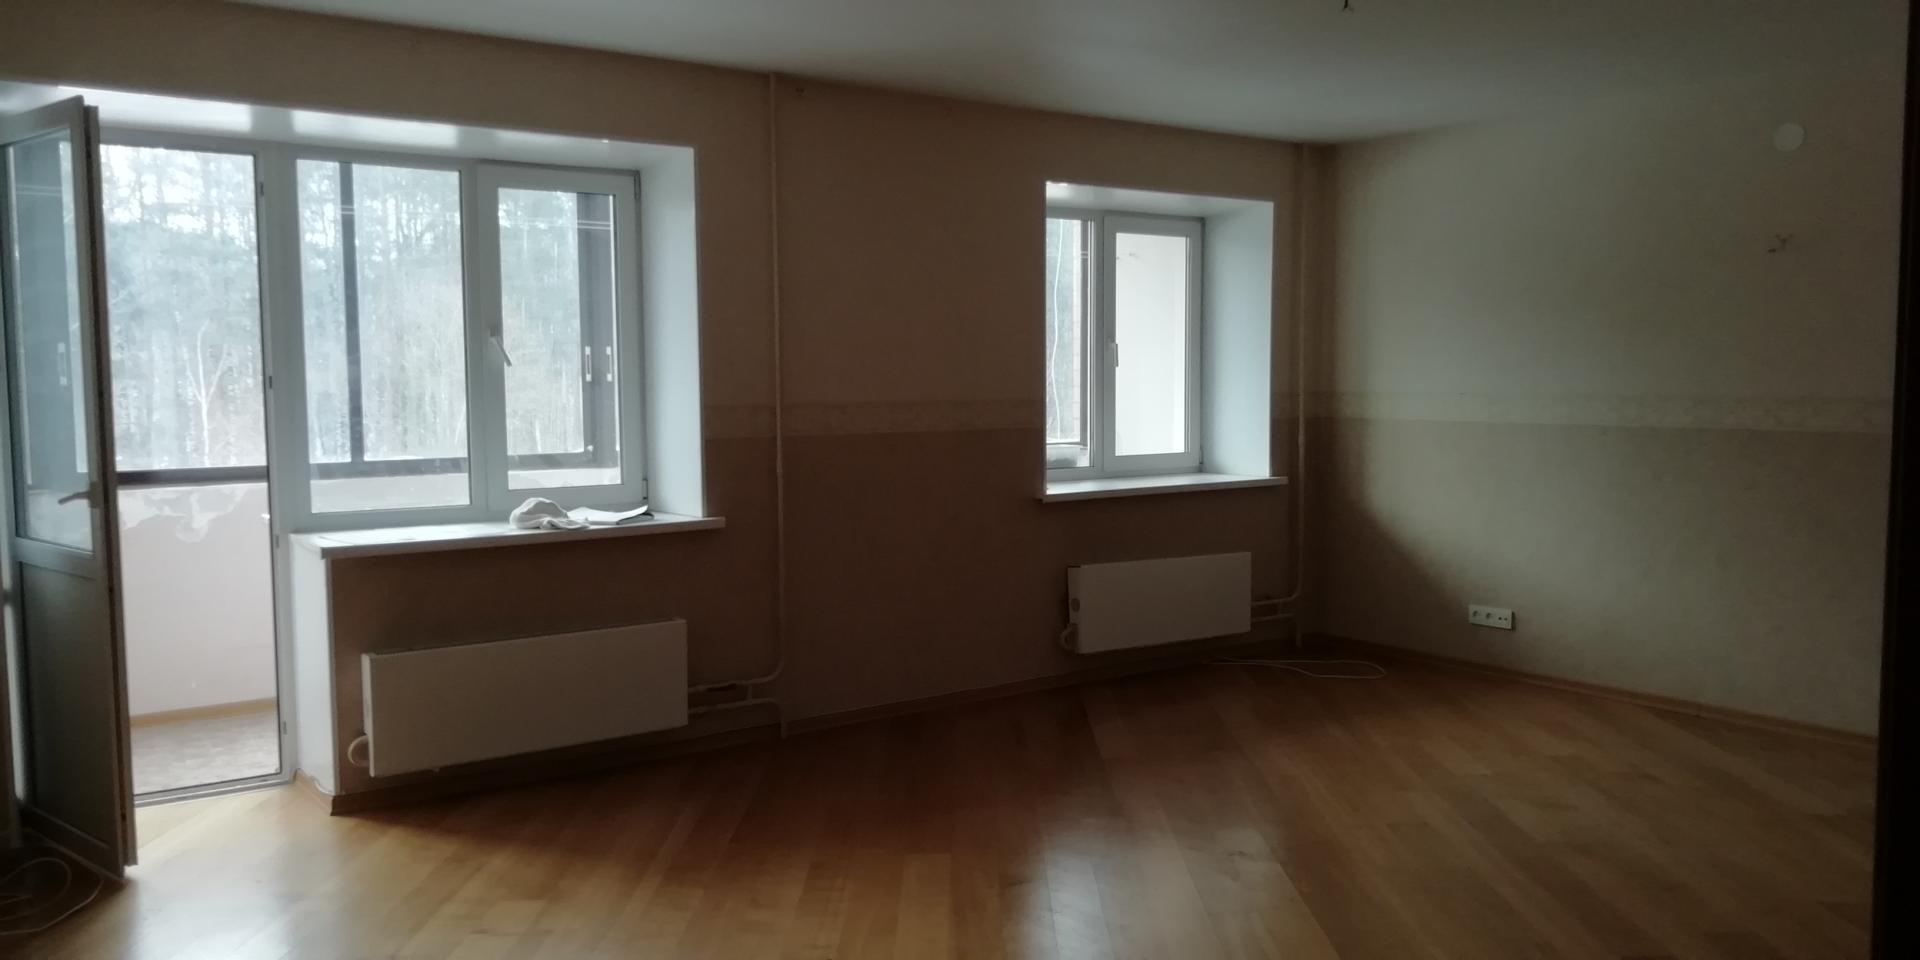 Продается трехкомнатная квартира за 7 300 000 рублей. Дубна, улица Вернова, 1.